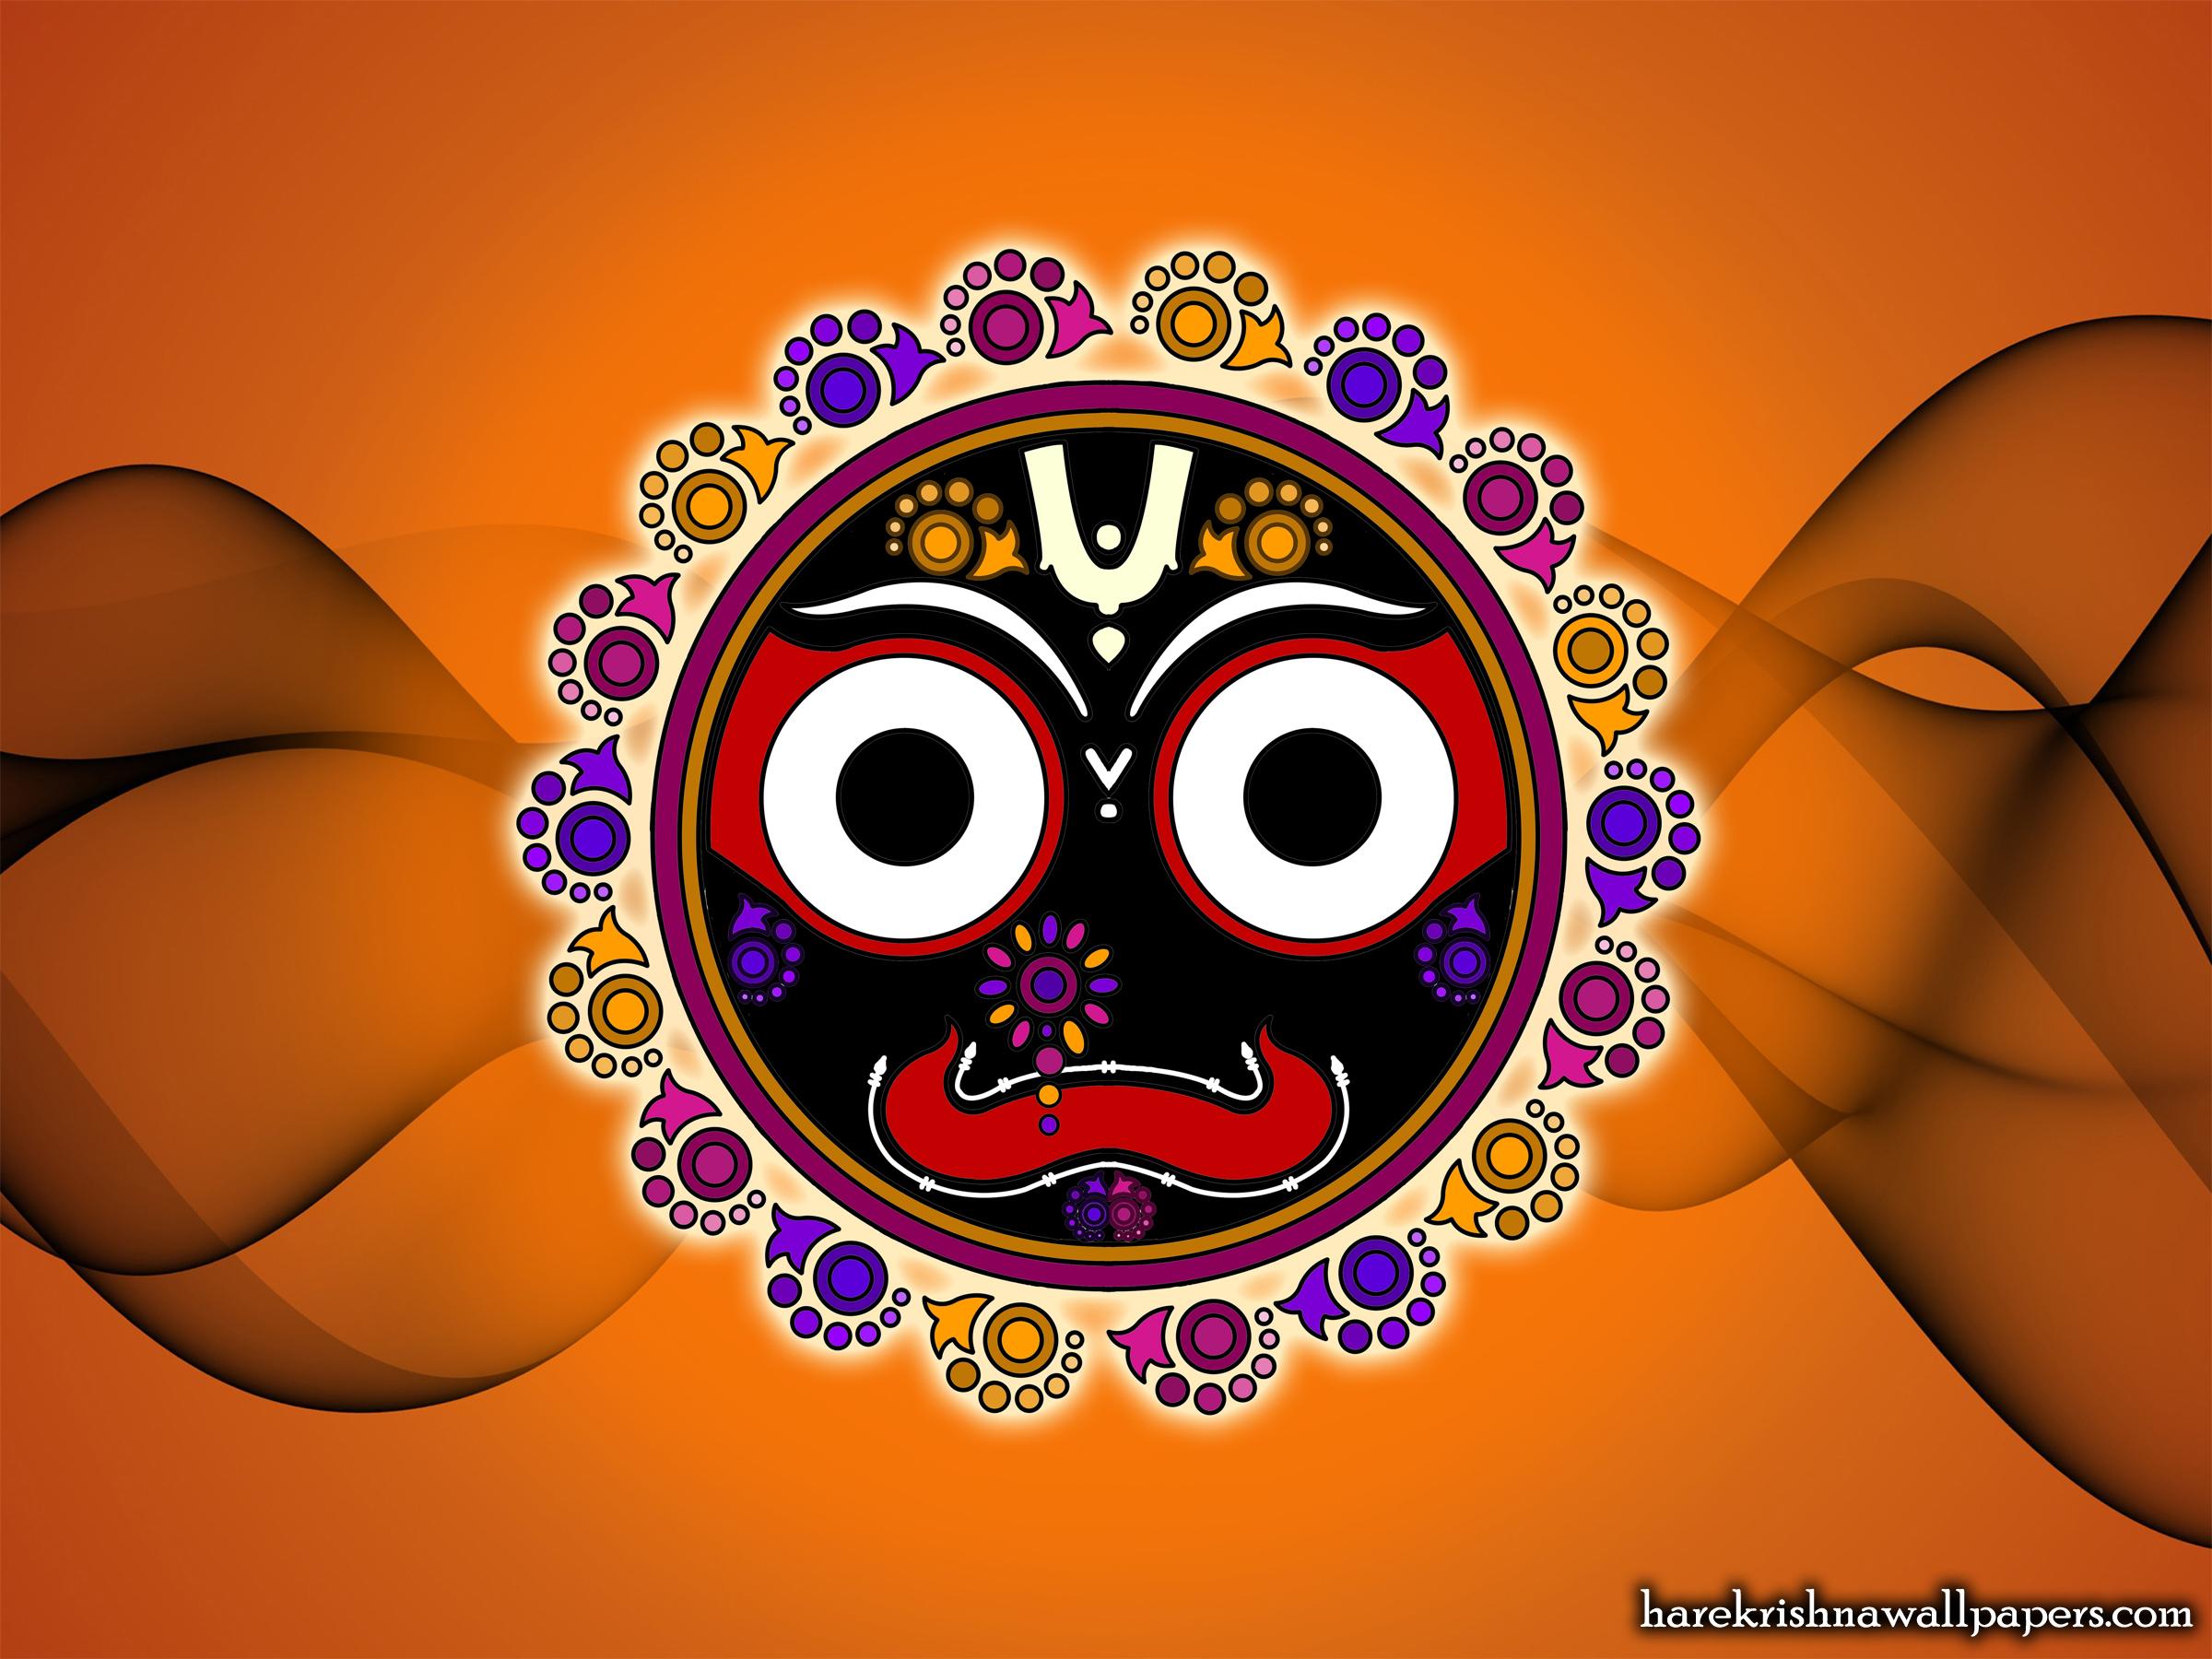 Jai Jagannath Wallpaper (043) Size 2400x1800 Download